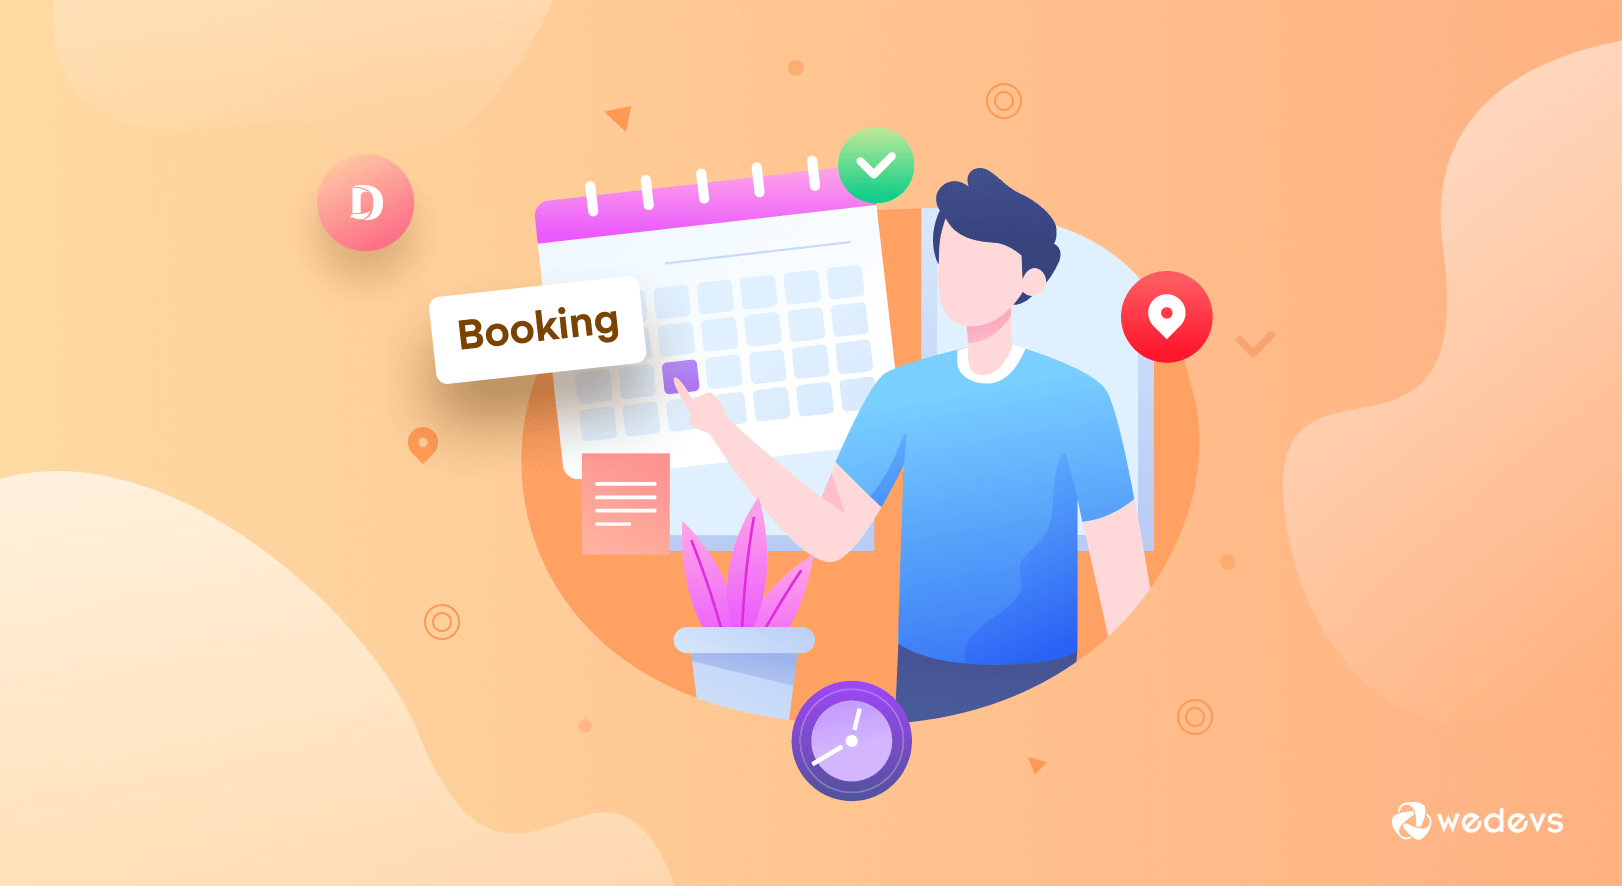 How to Use Dokan WooCommerce Booking Integration (WordPress Booking Module Tutorial)